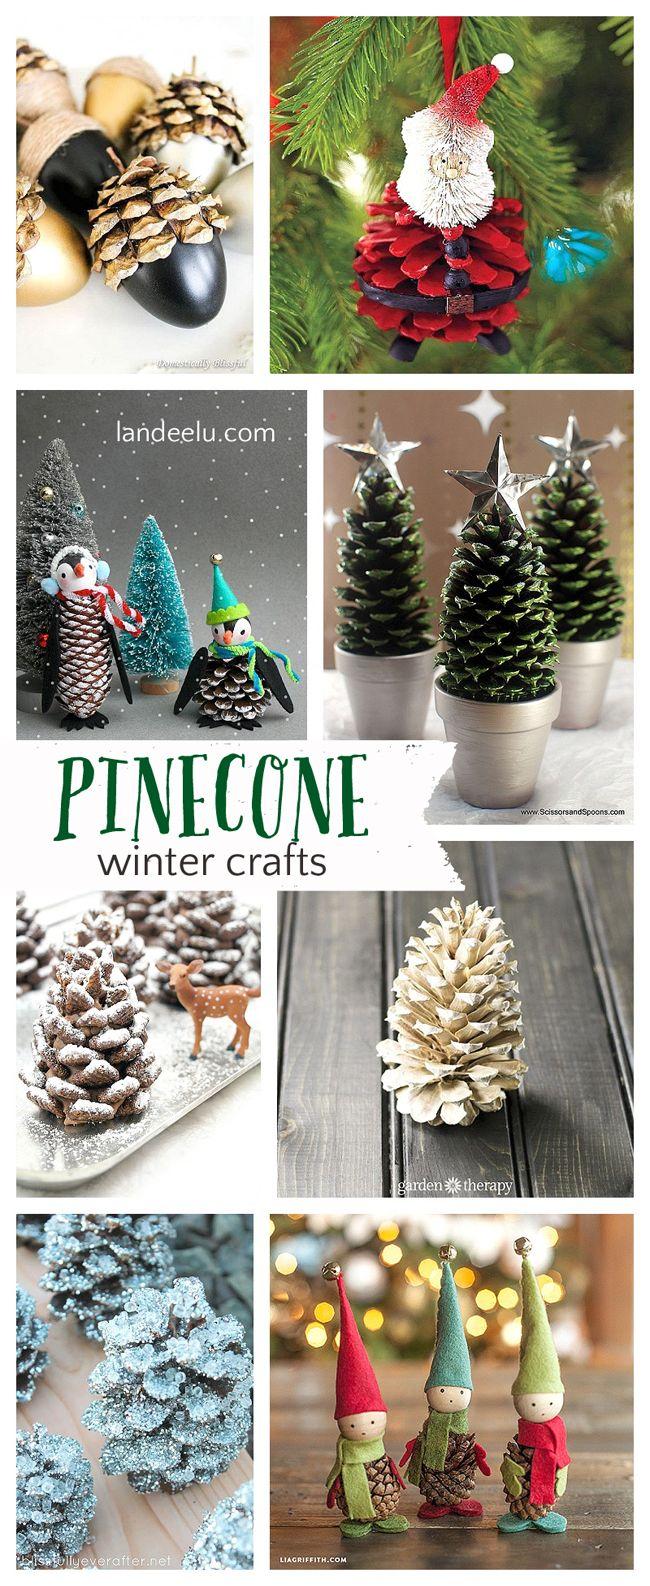 Craft Pretty Winter Crafts using Pinecones